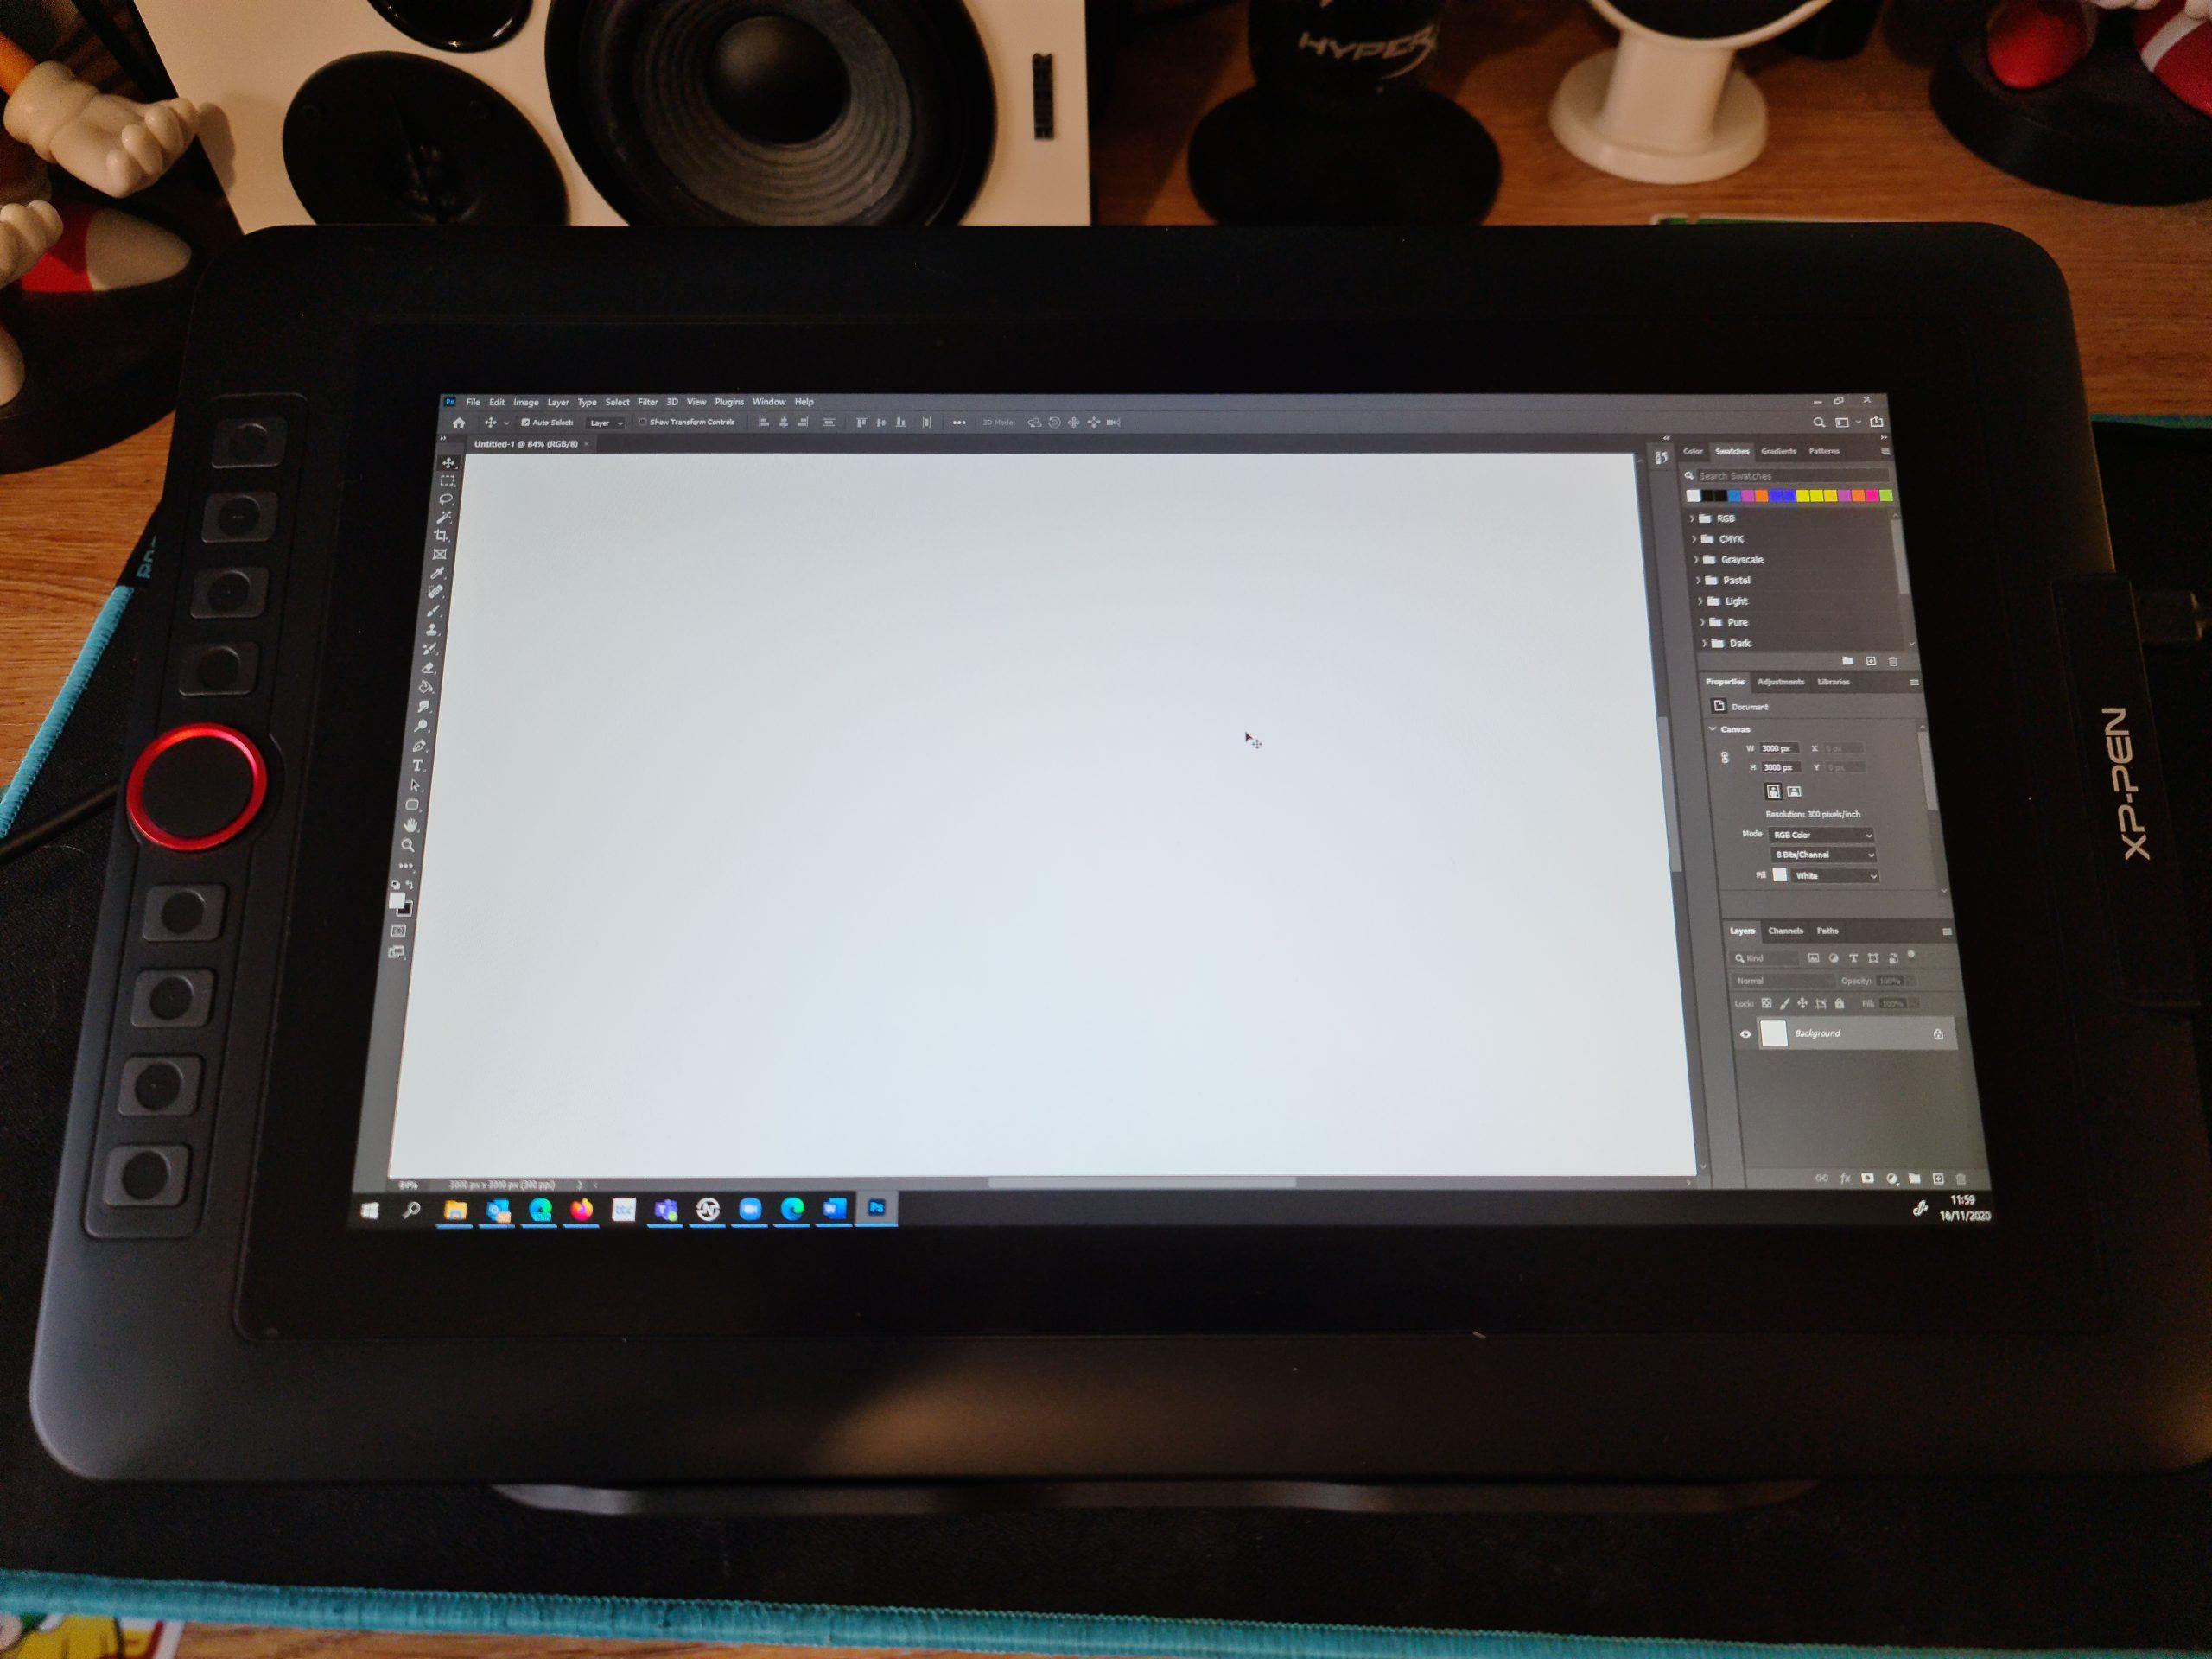 XP-PEN Artist Display 13.3 Pro Review